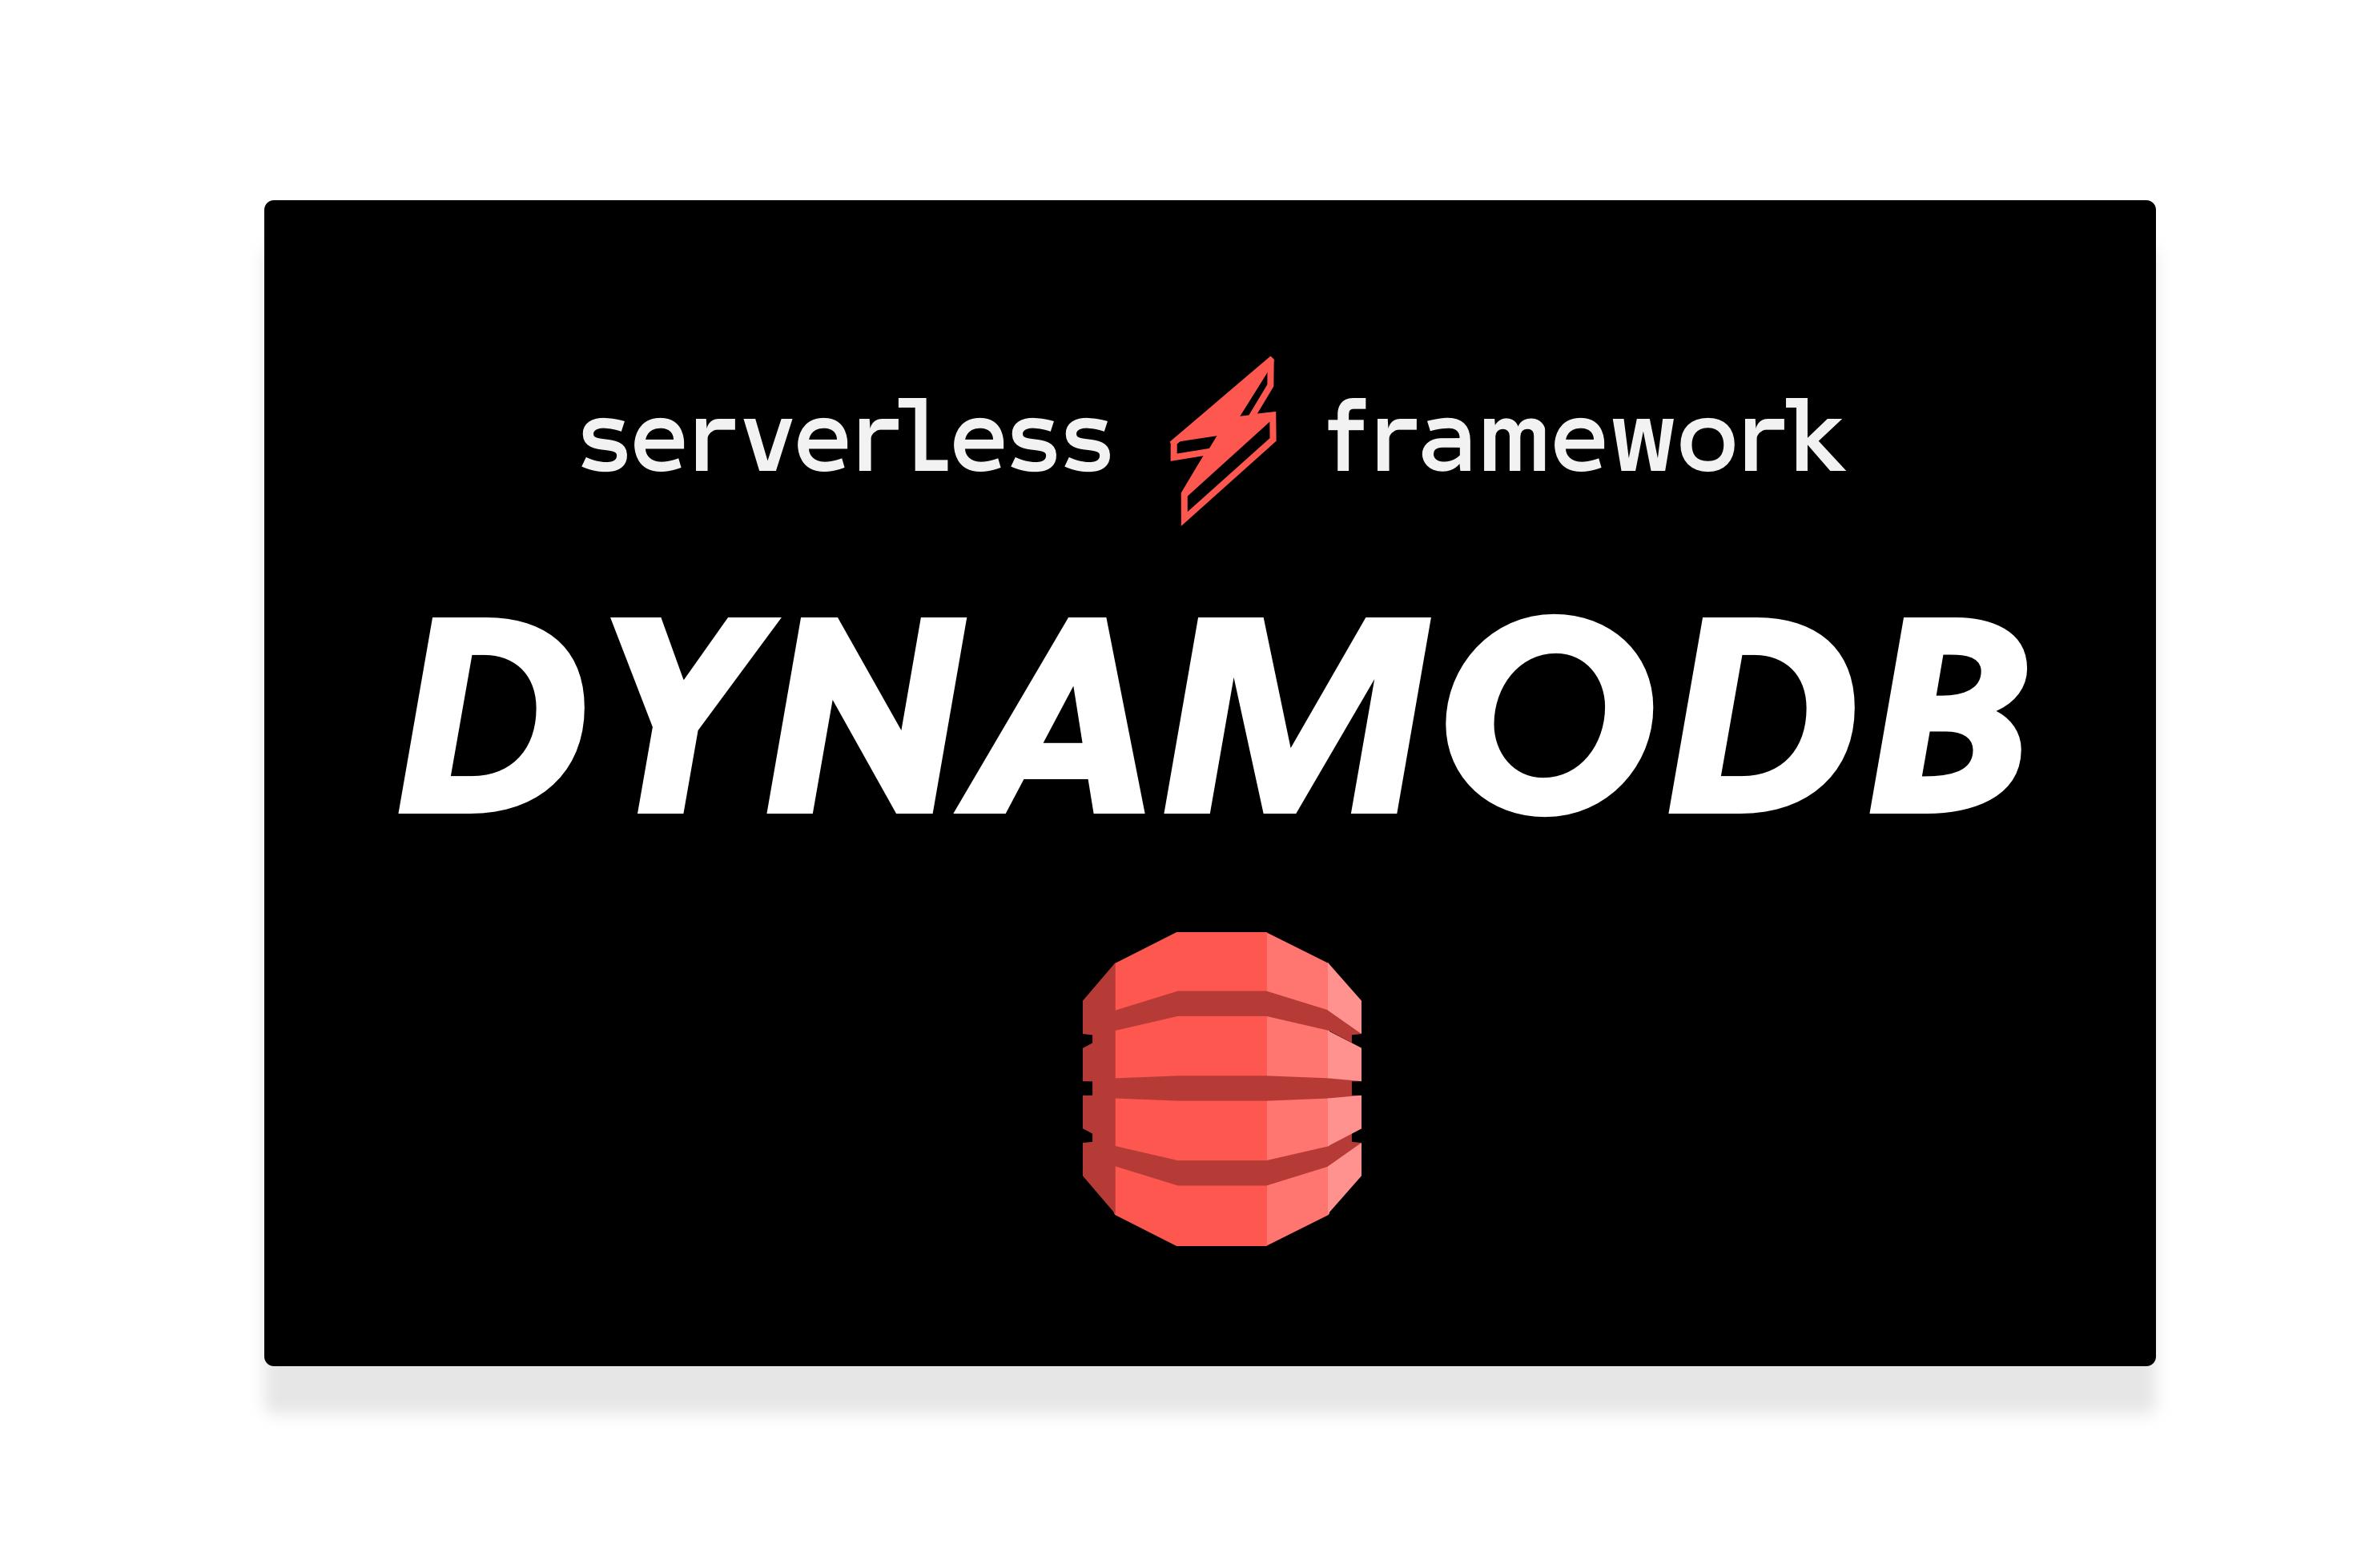 serverless framework dynamodb